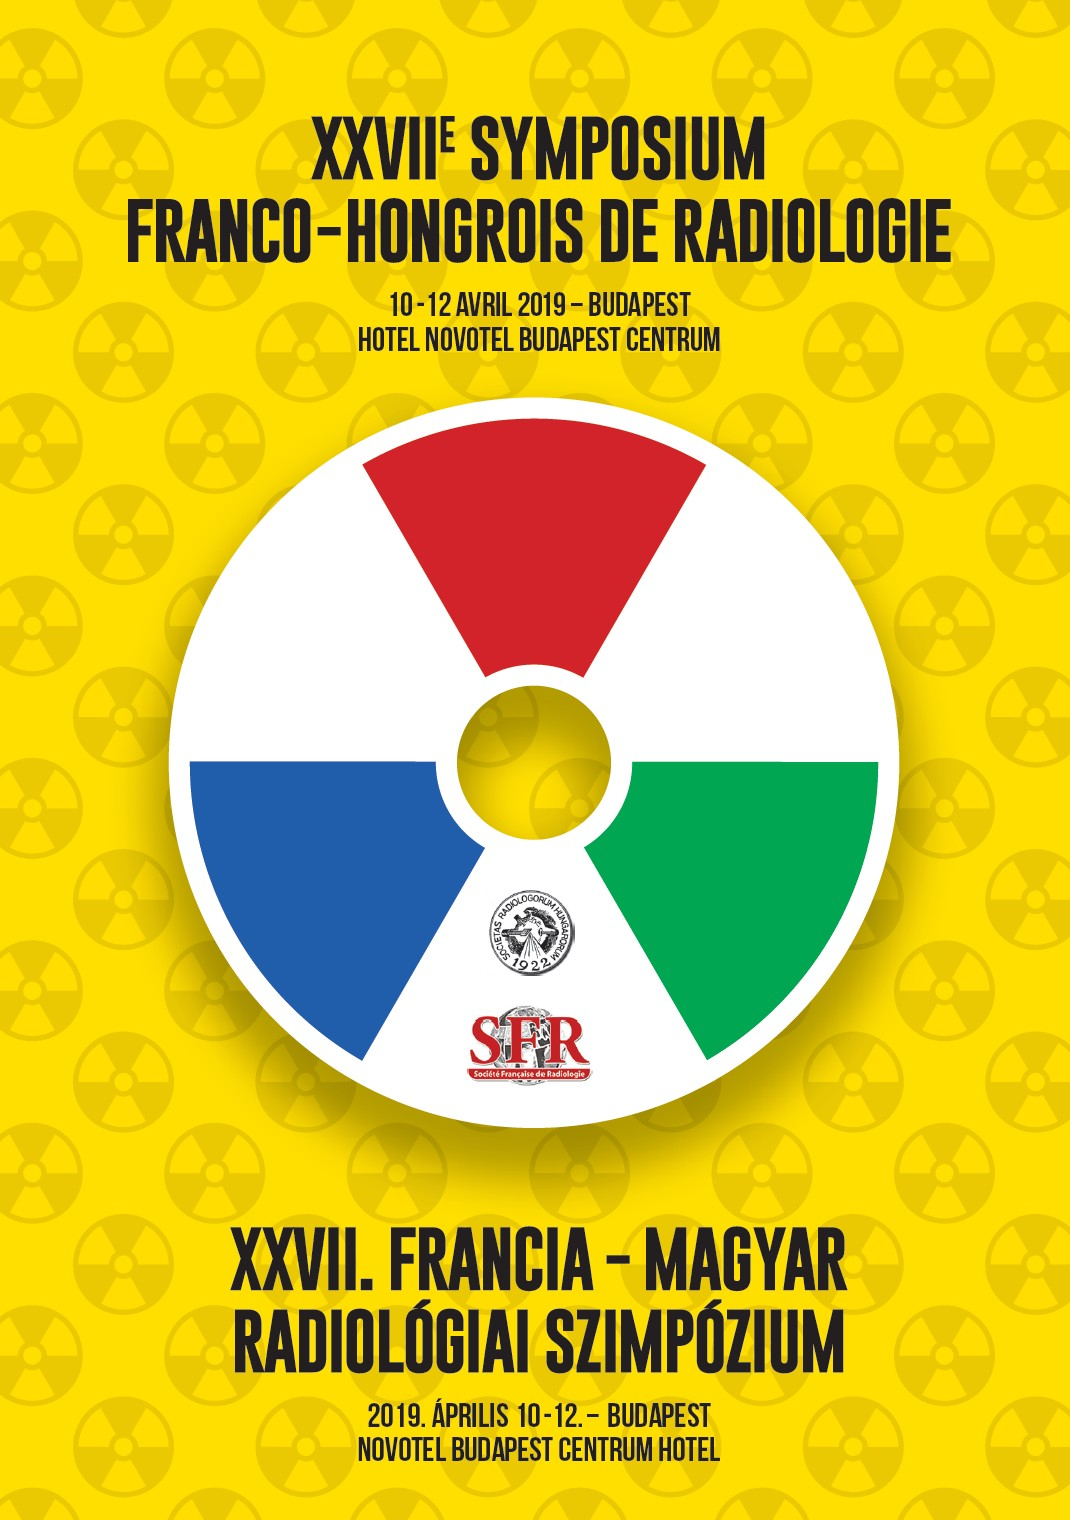 2019. 04.10-12.: XXVII. Francia-Magyar Radiológiai Szimpózium